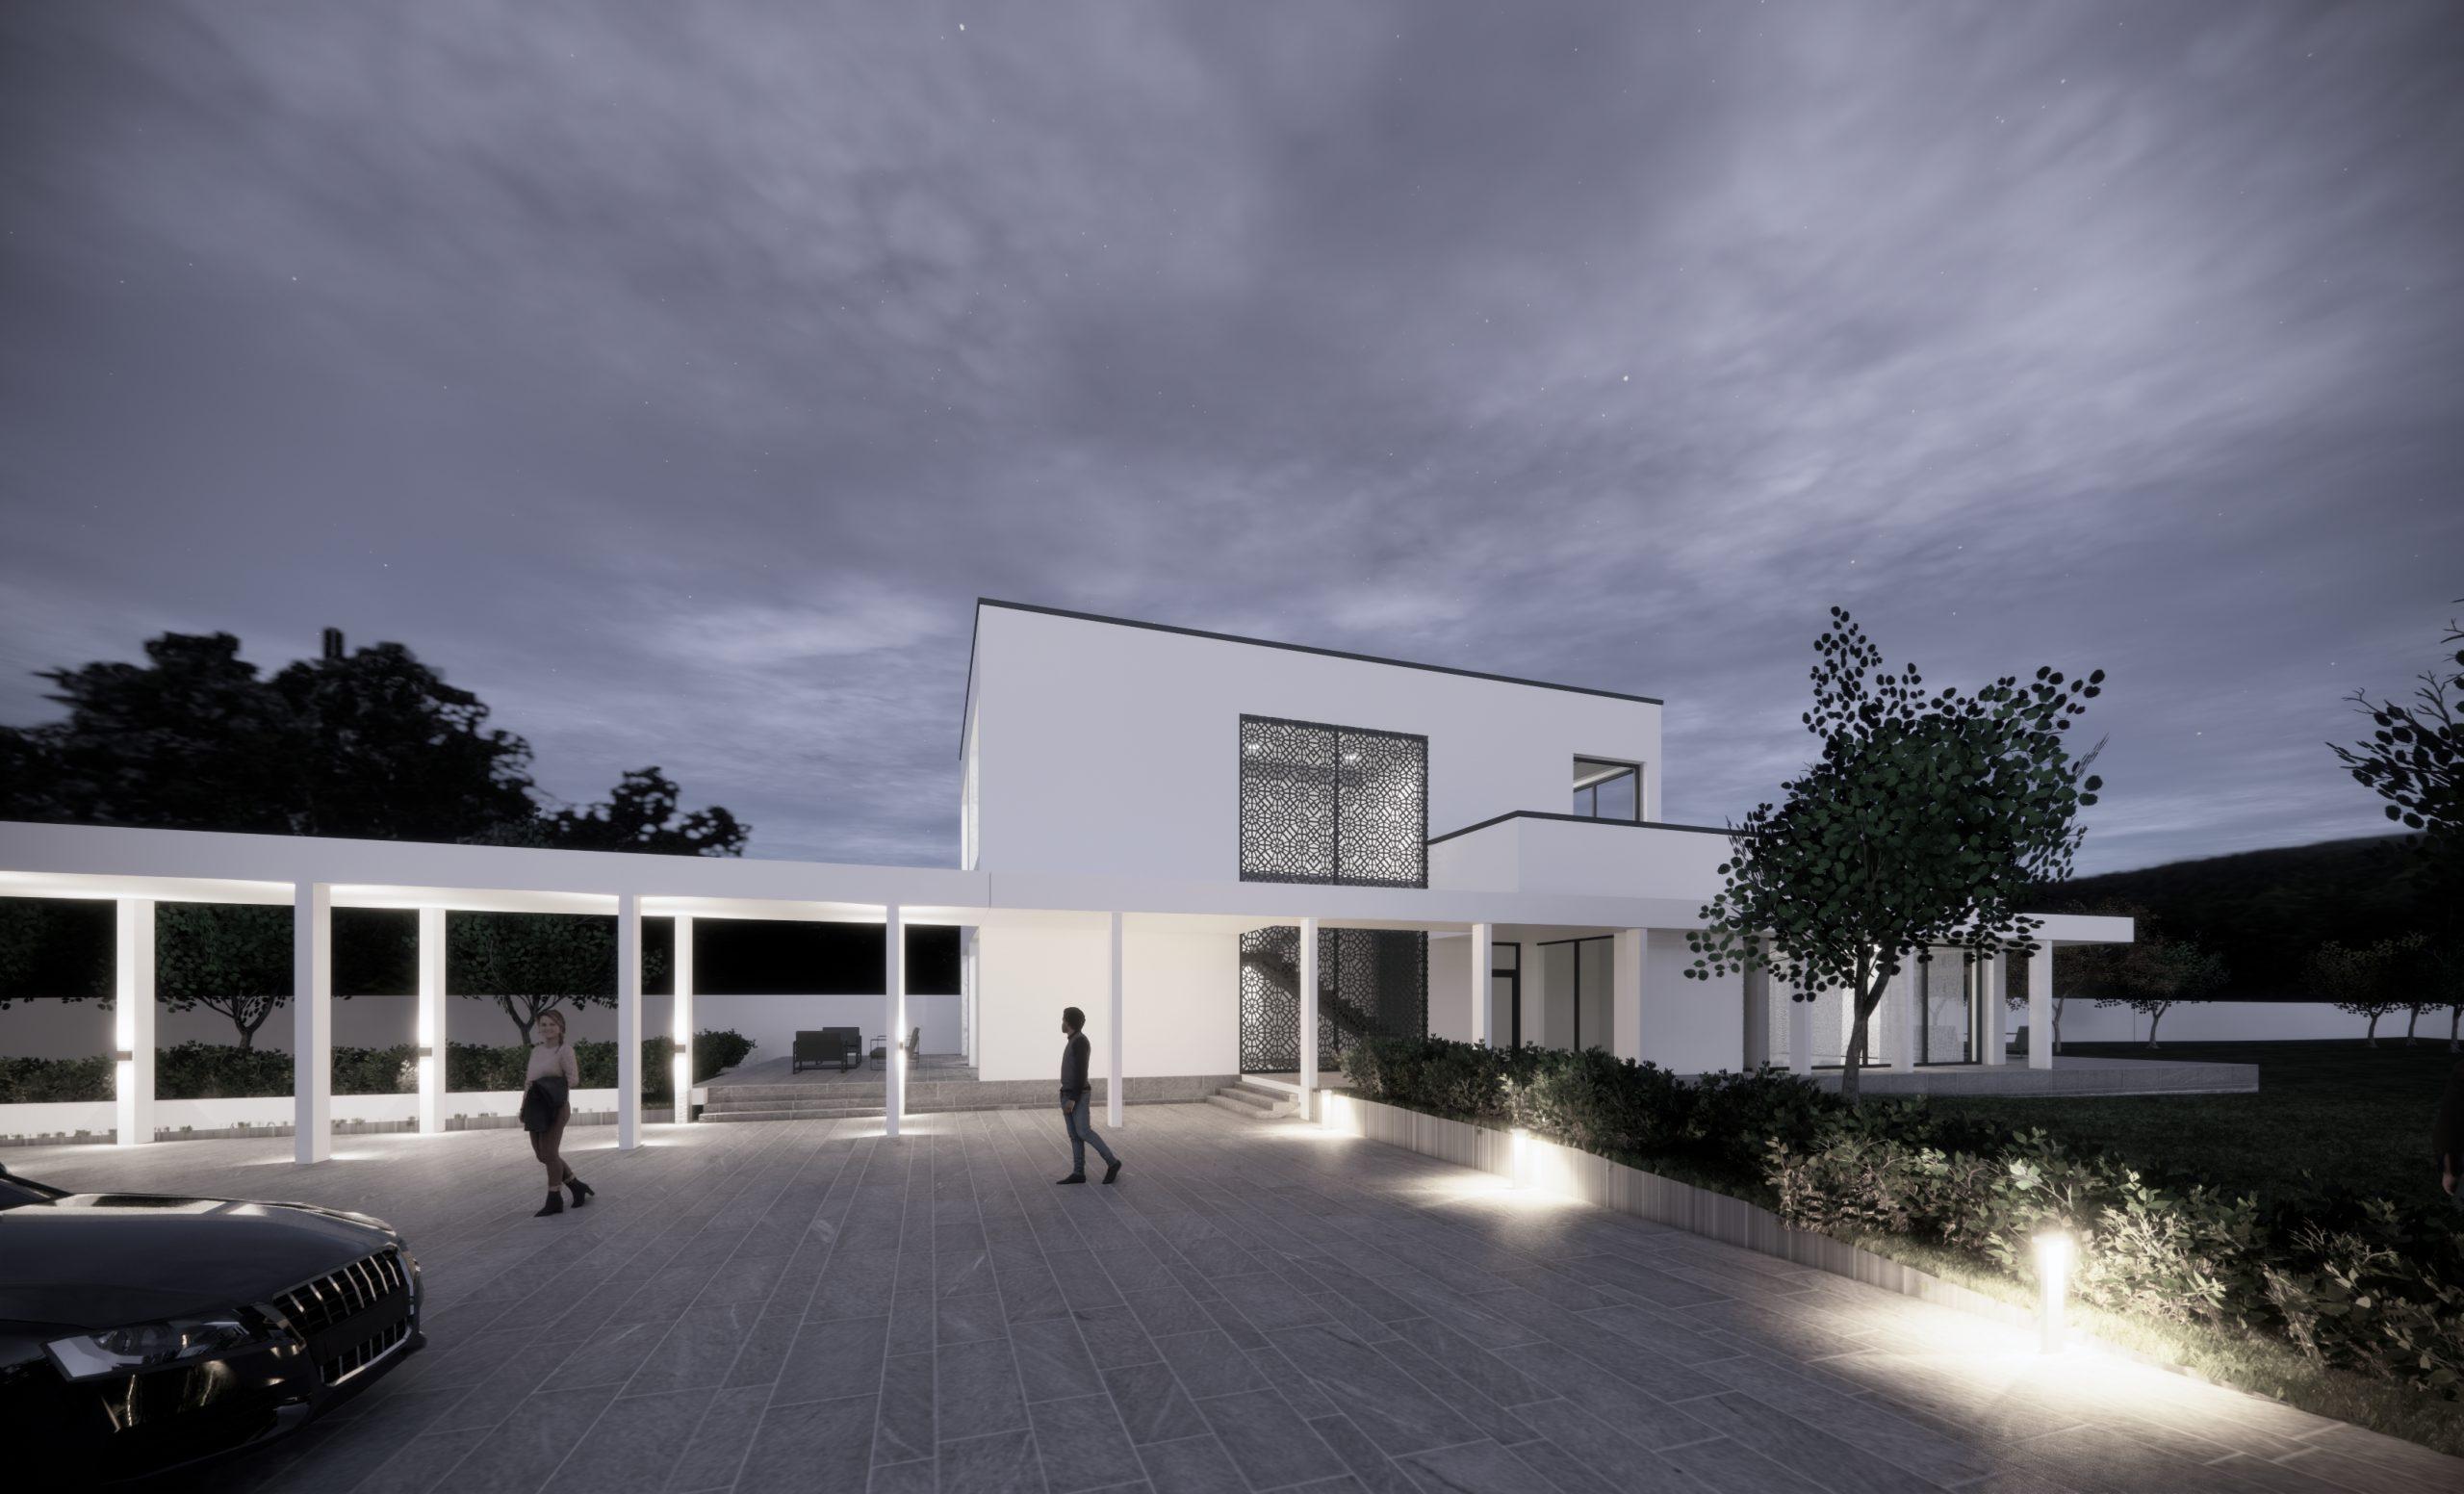 https://nbc-arhitect.ro/wp-content/uploads/2020/11/NBC-Arhitect-_-residential-_-2x-Snagov-_-Snagov-Romania_27-scaled.jpg